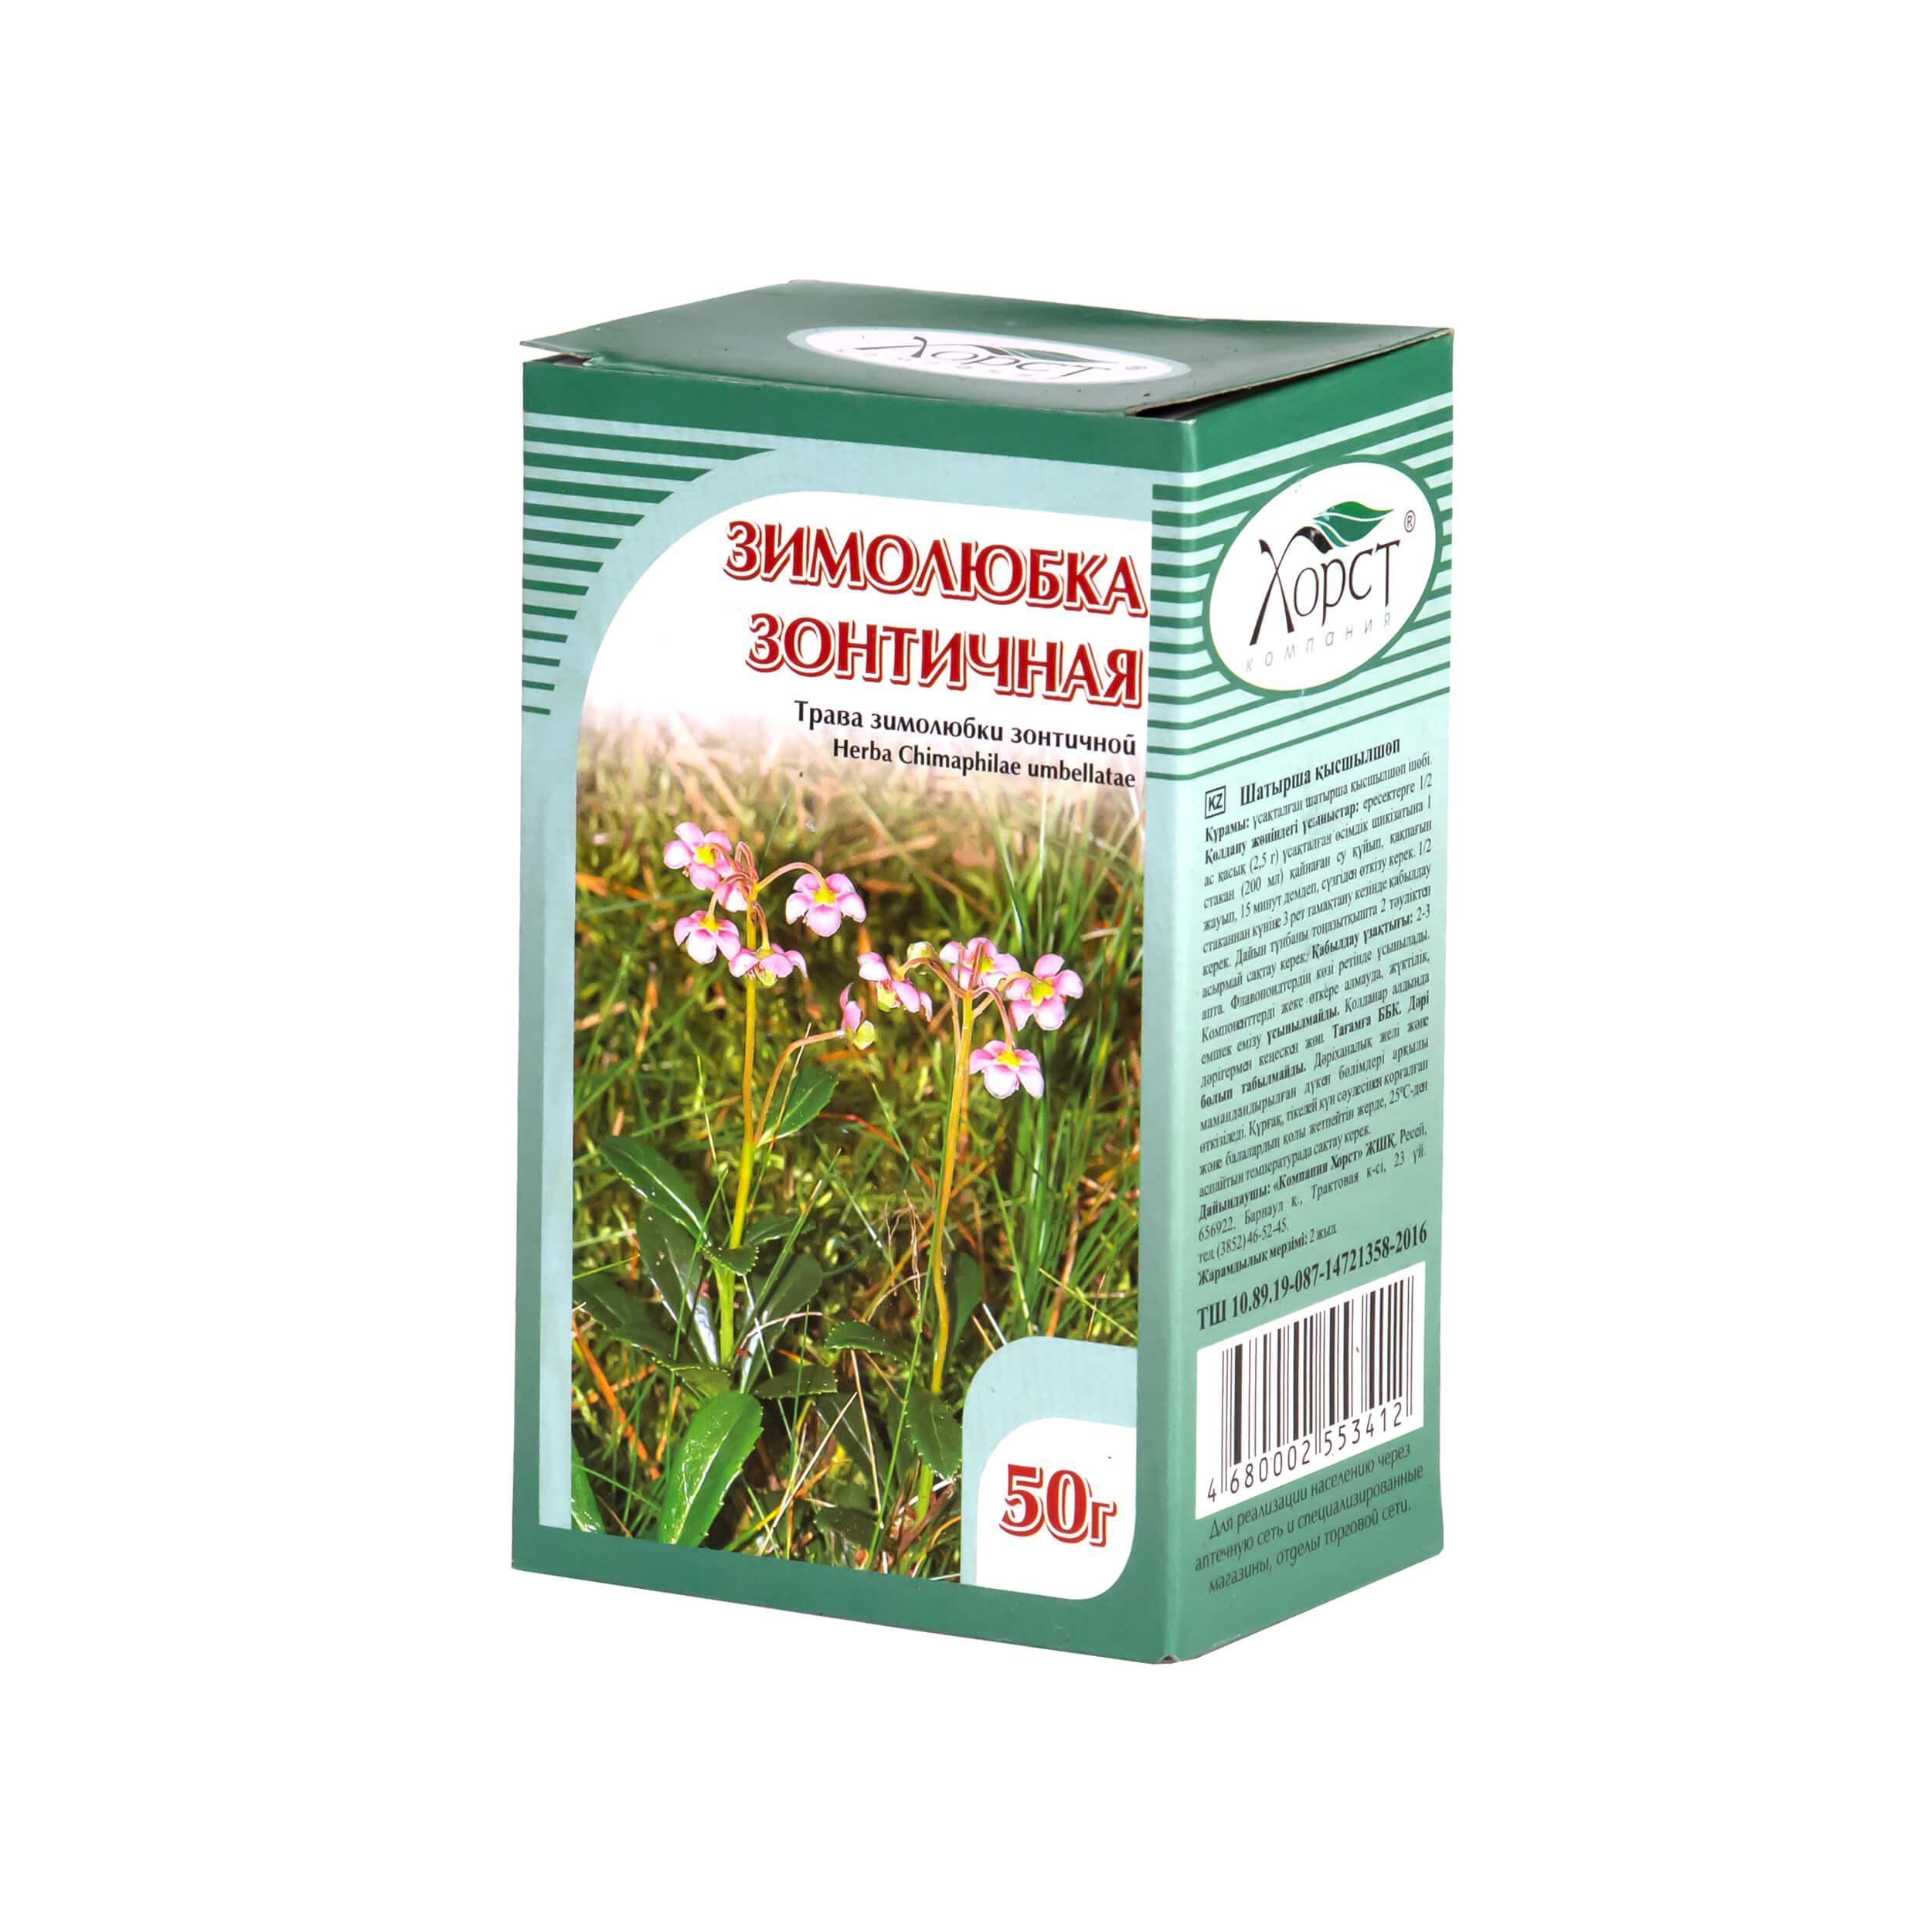 Зимолюбка зонтичная (трава, 50 грамм) фото